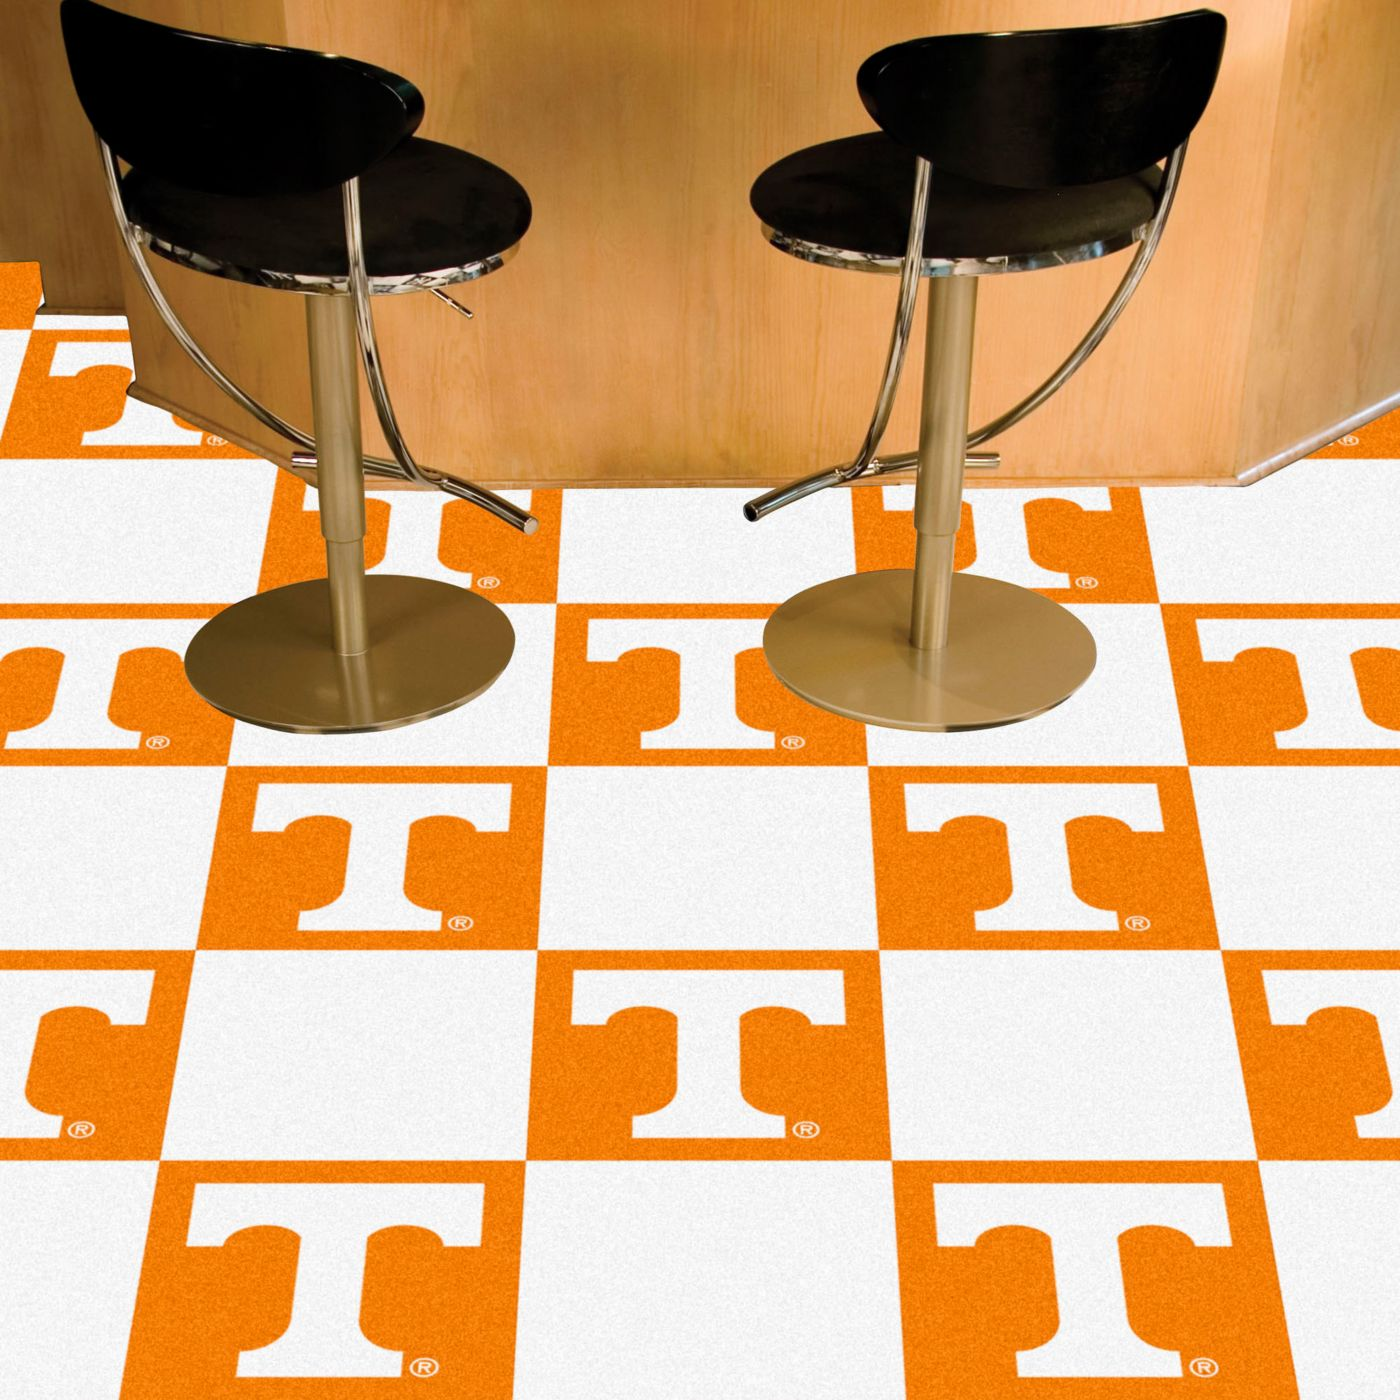 FANMATS Tennessee Volunteers Team Carpet Tiles